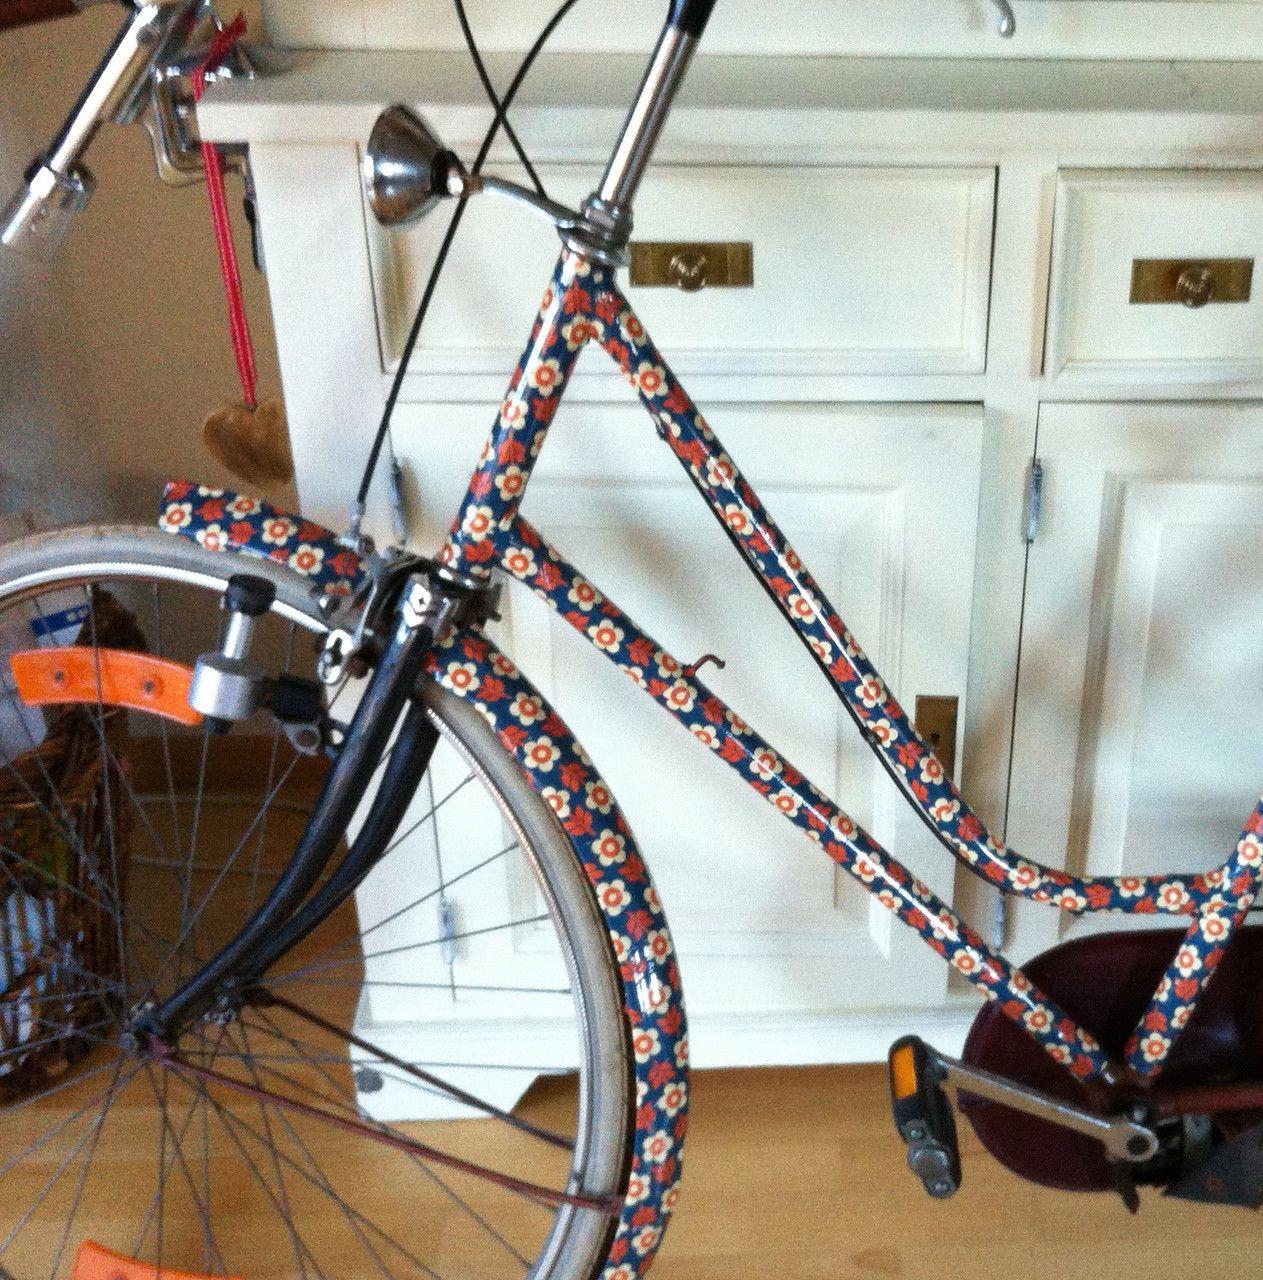 mooxibike fahrrad folie blumen diy basteln pinterest. Black Bedroom Furniture Sets. Home Design Ideas